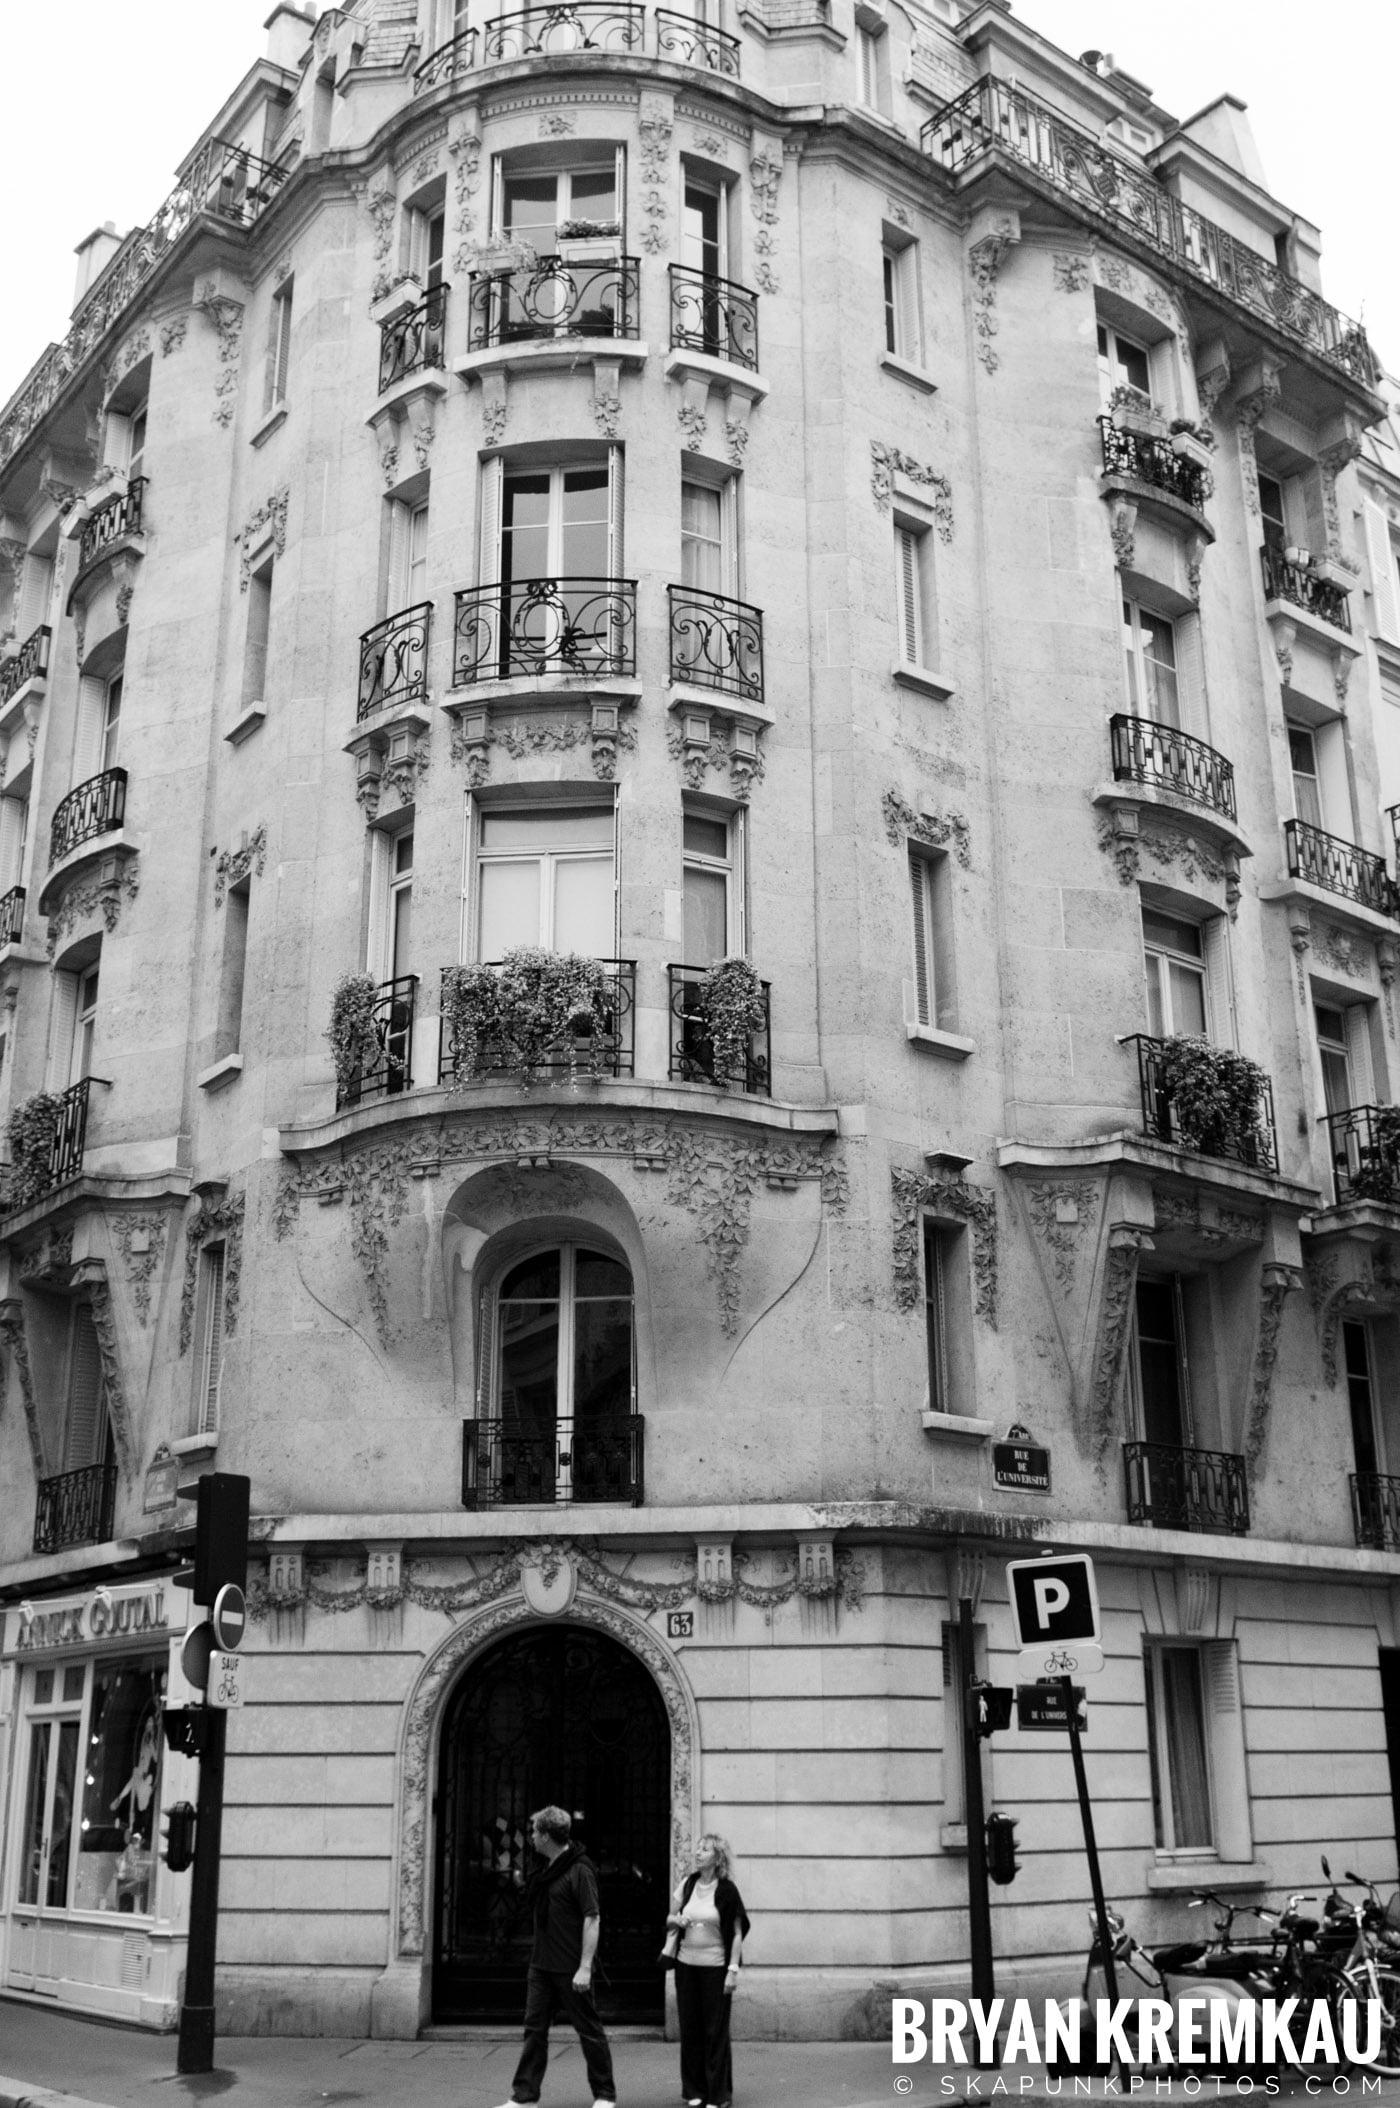 Paris, France Honeymoon - Day 4 - 7.21.11 (63)